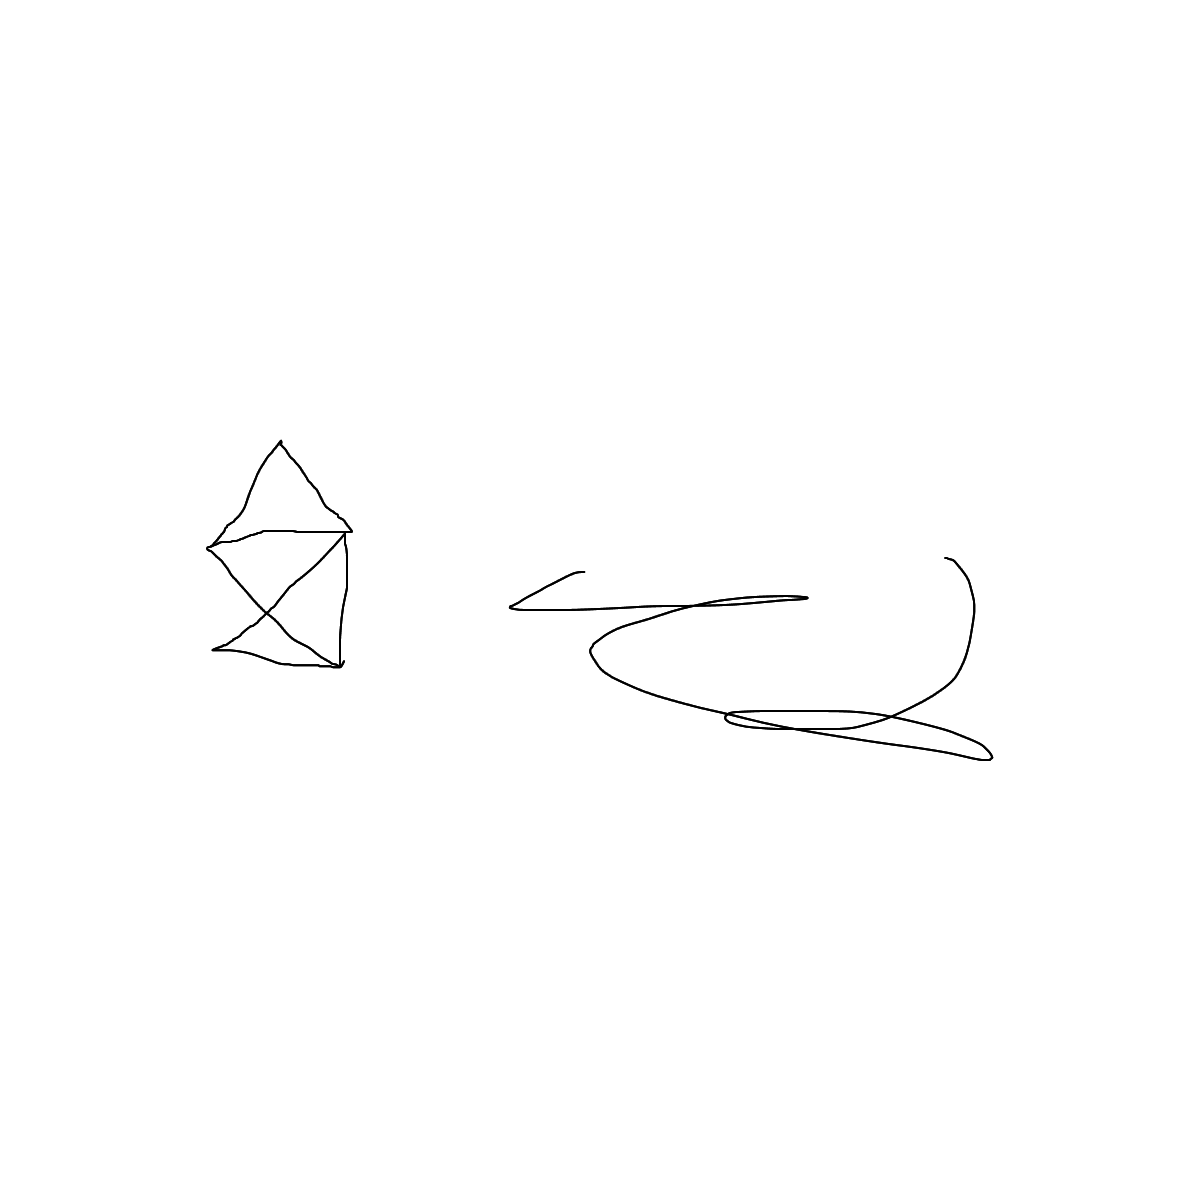 BAAAM drawing#28 lat:40.8503875732421900lng: 14.3042850494384770